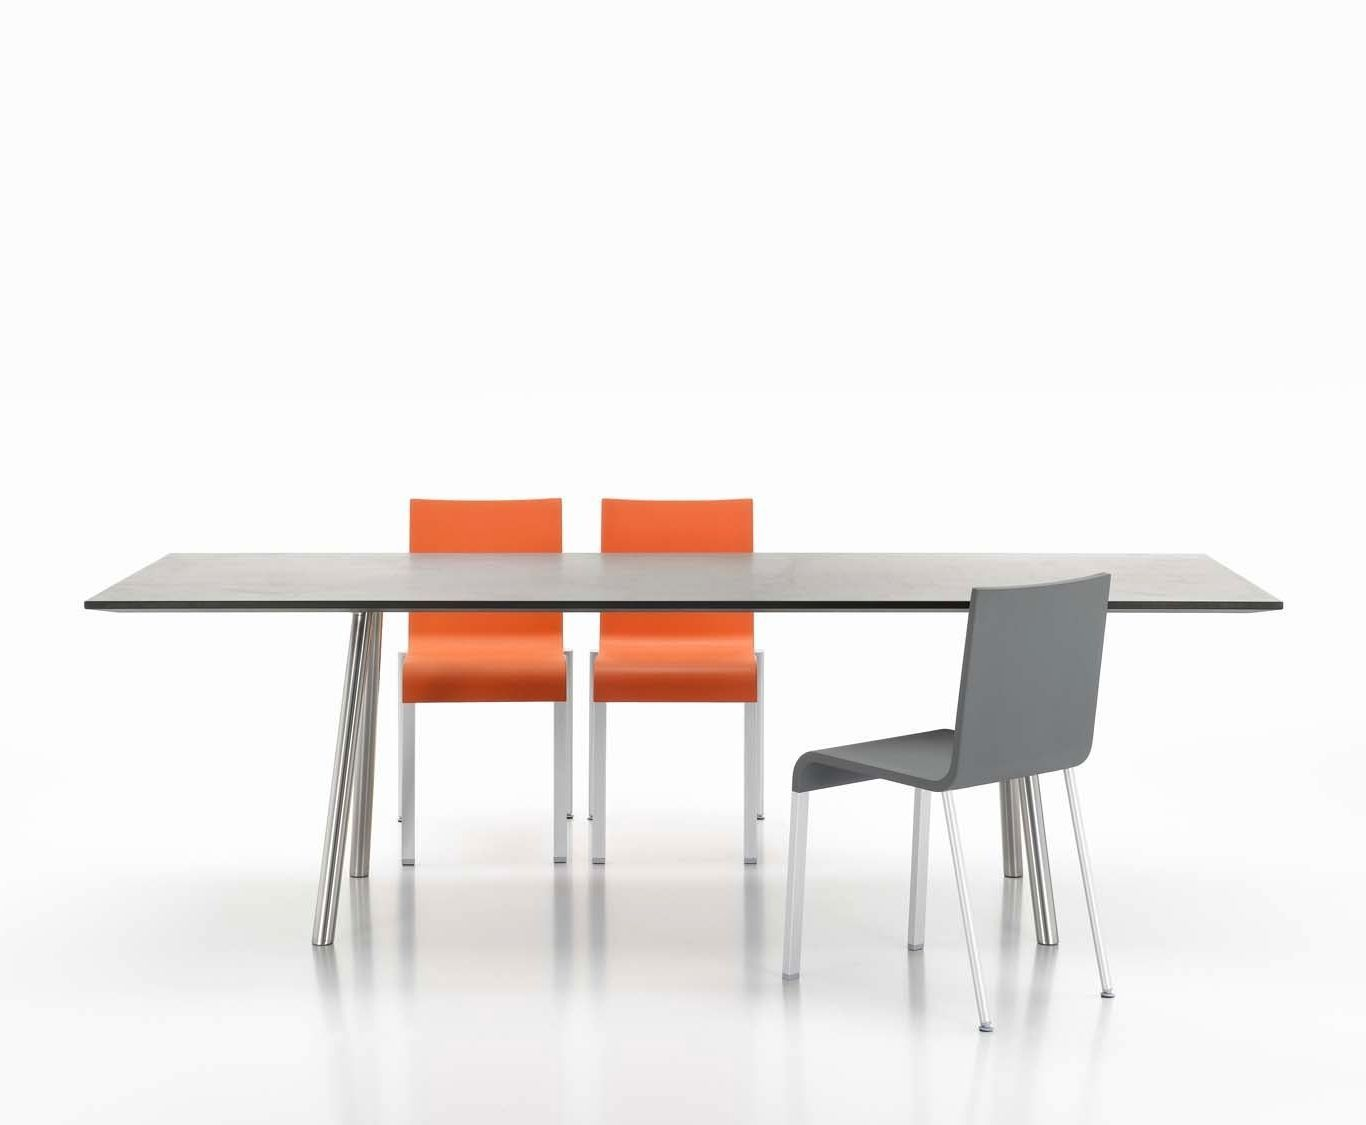 Vitra Maarten van Severen Hier vindt u de Vitra MVS Chaise – Vitra 03 Chair